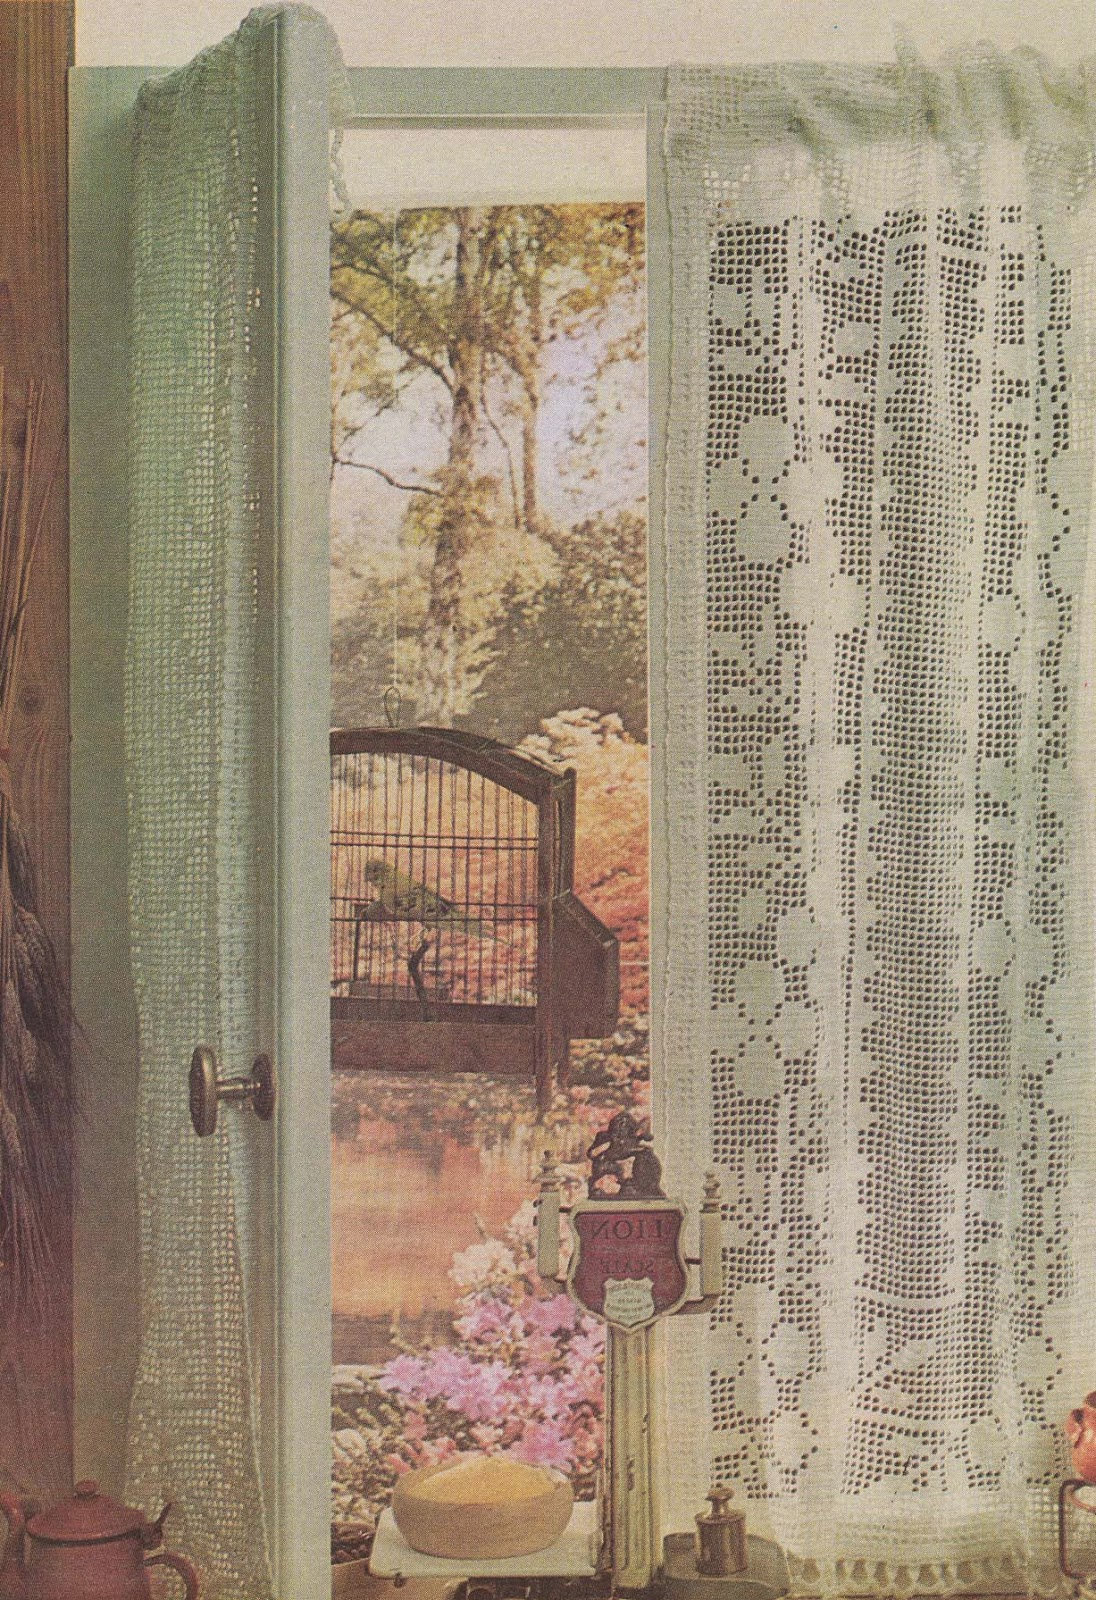 antoniadaix rideaux au crochet d 39 art. Black Bedroom Furniture Sets. Home Design Ideas